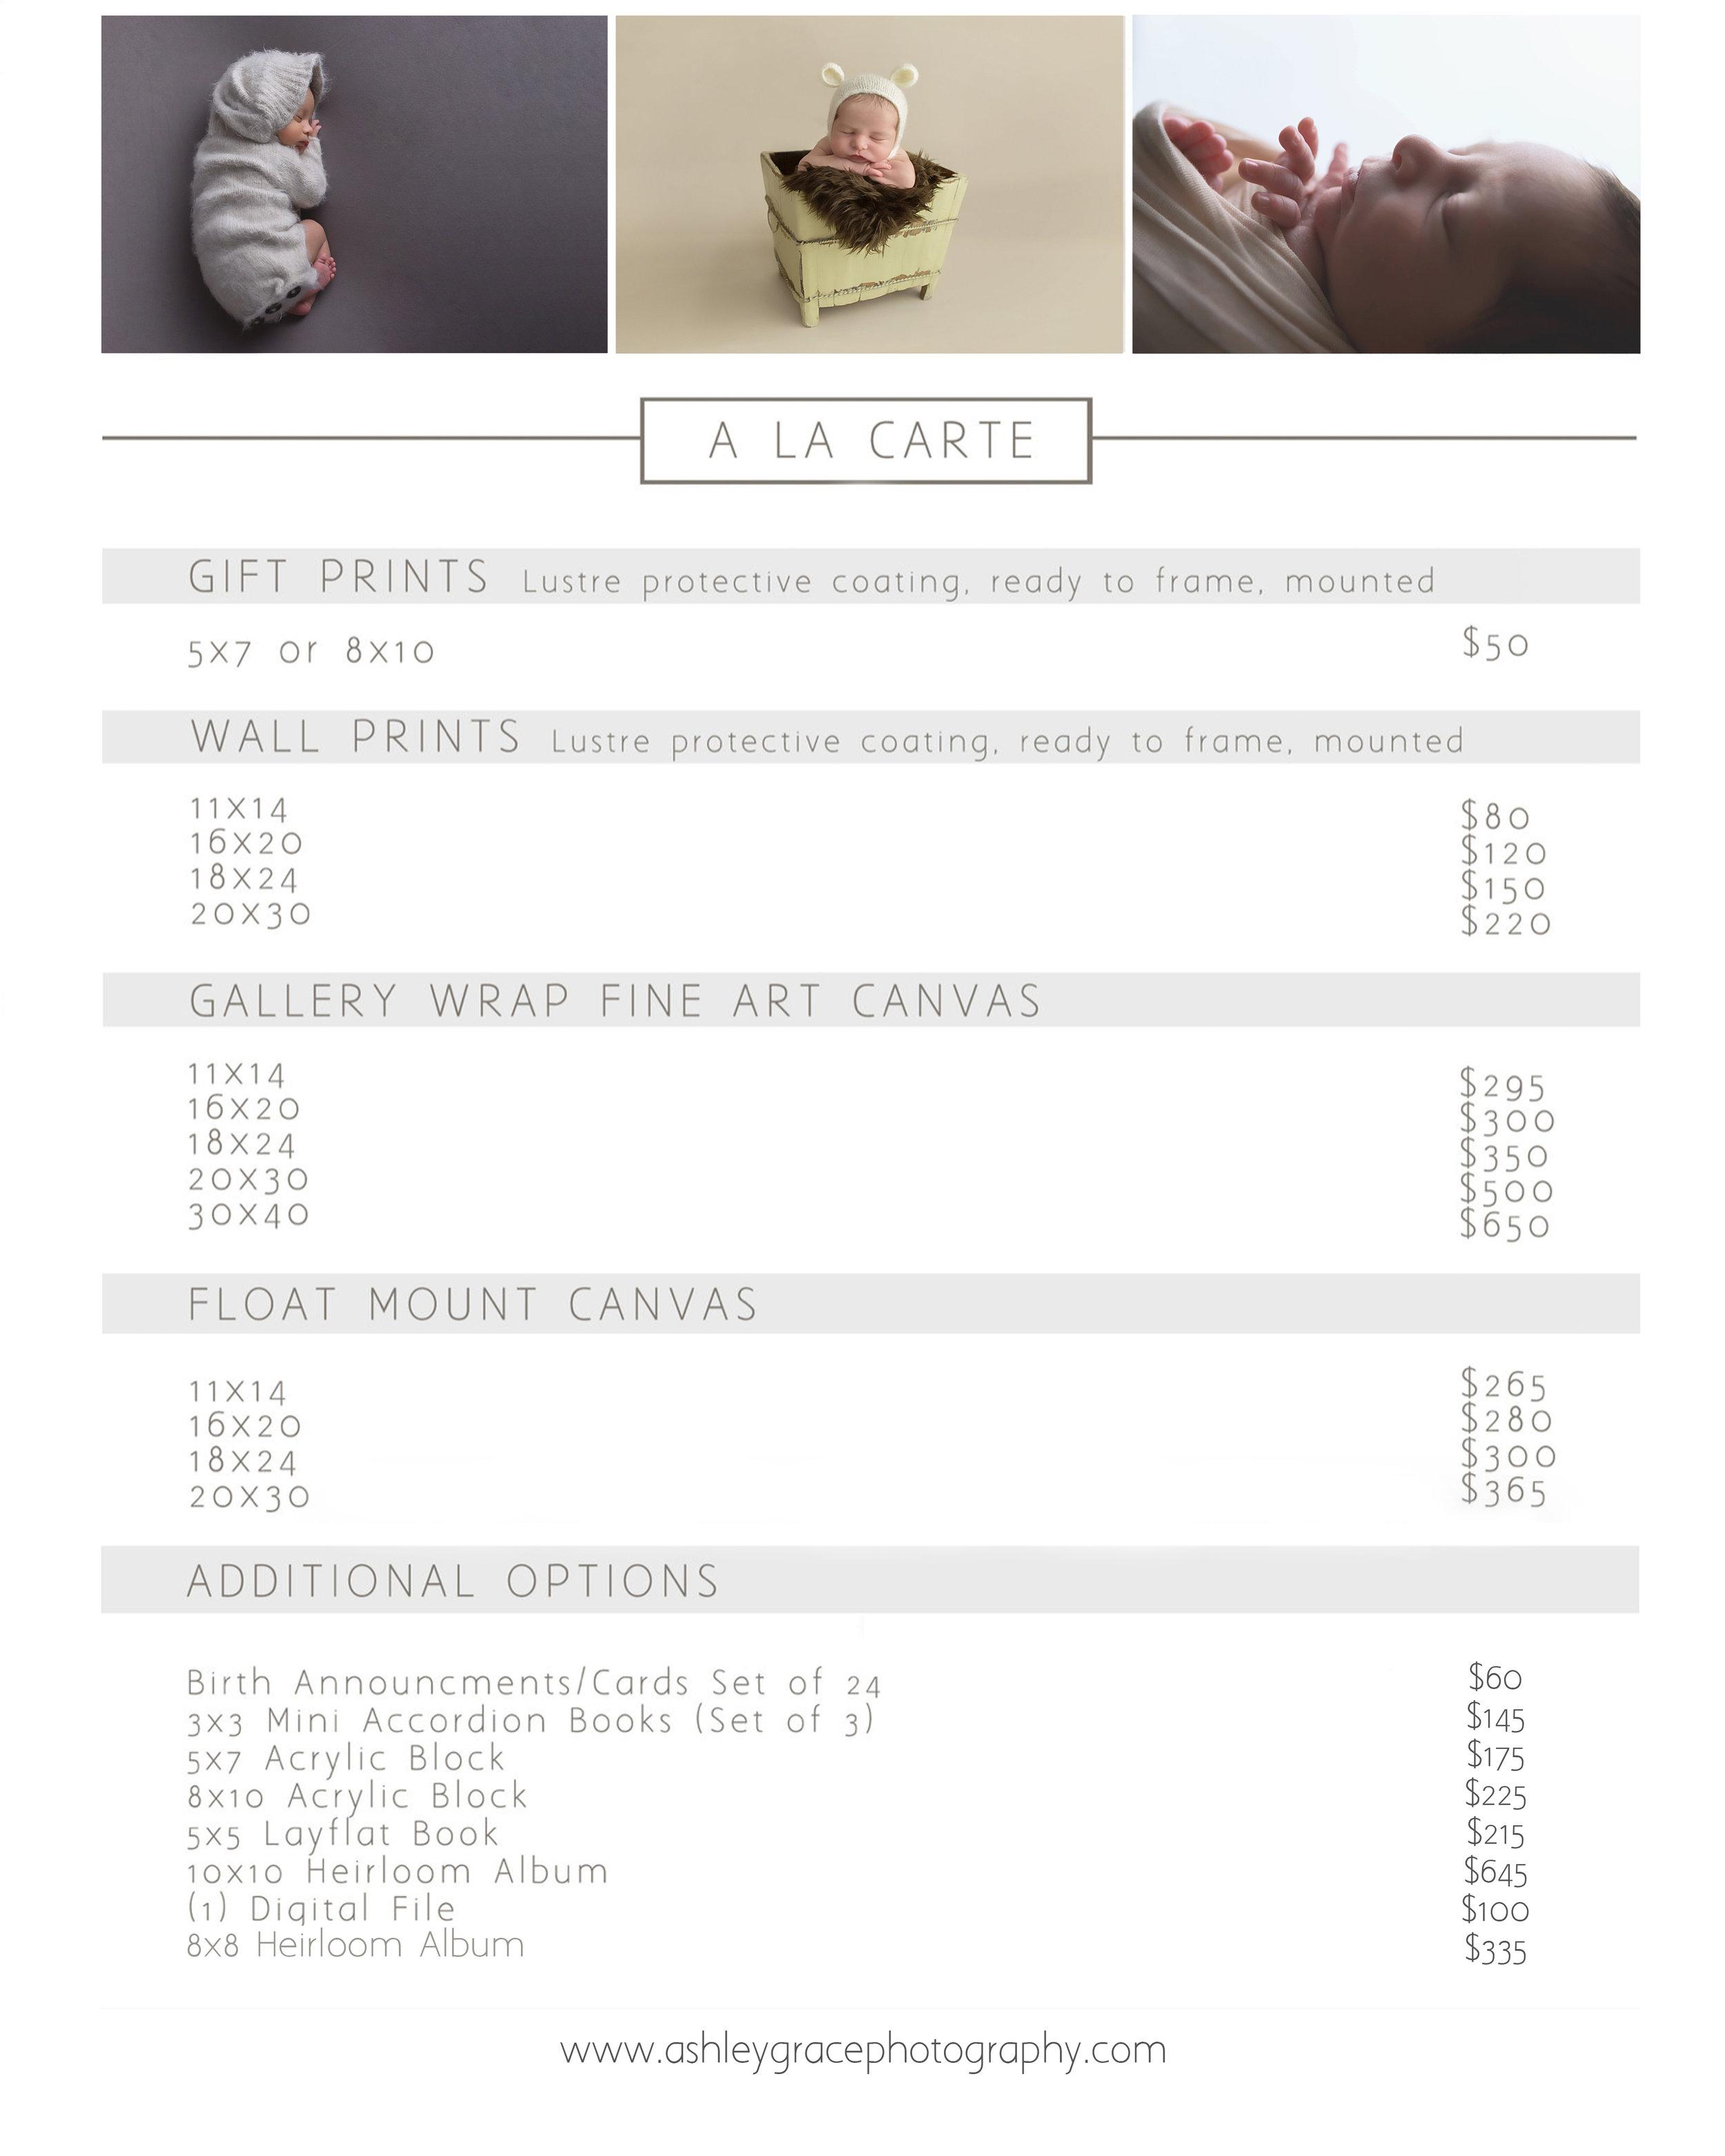 Pricing - A la carte.jpg